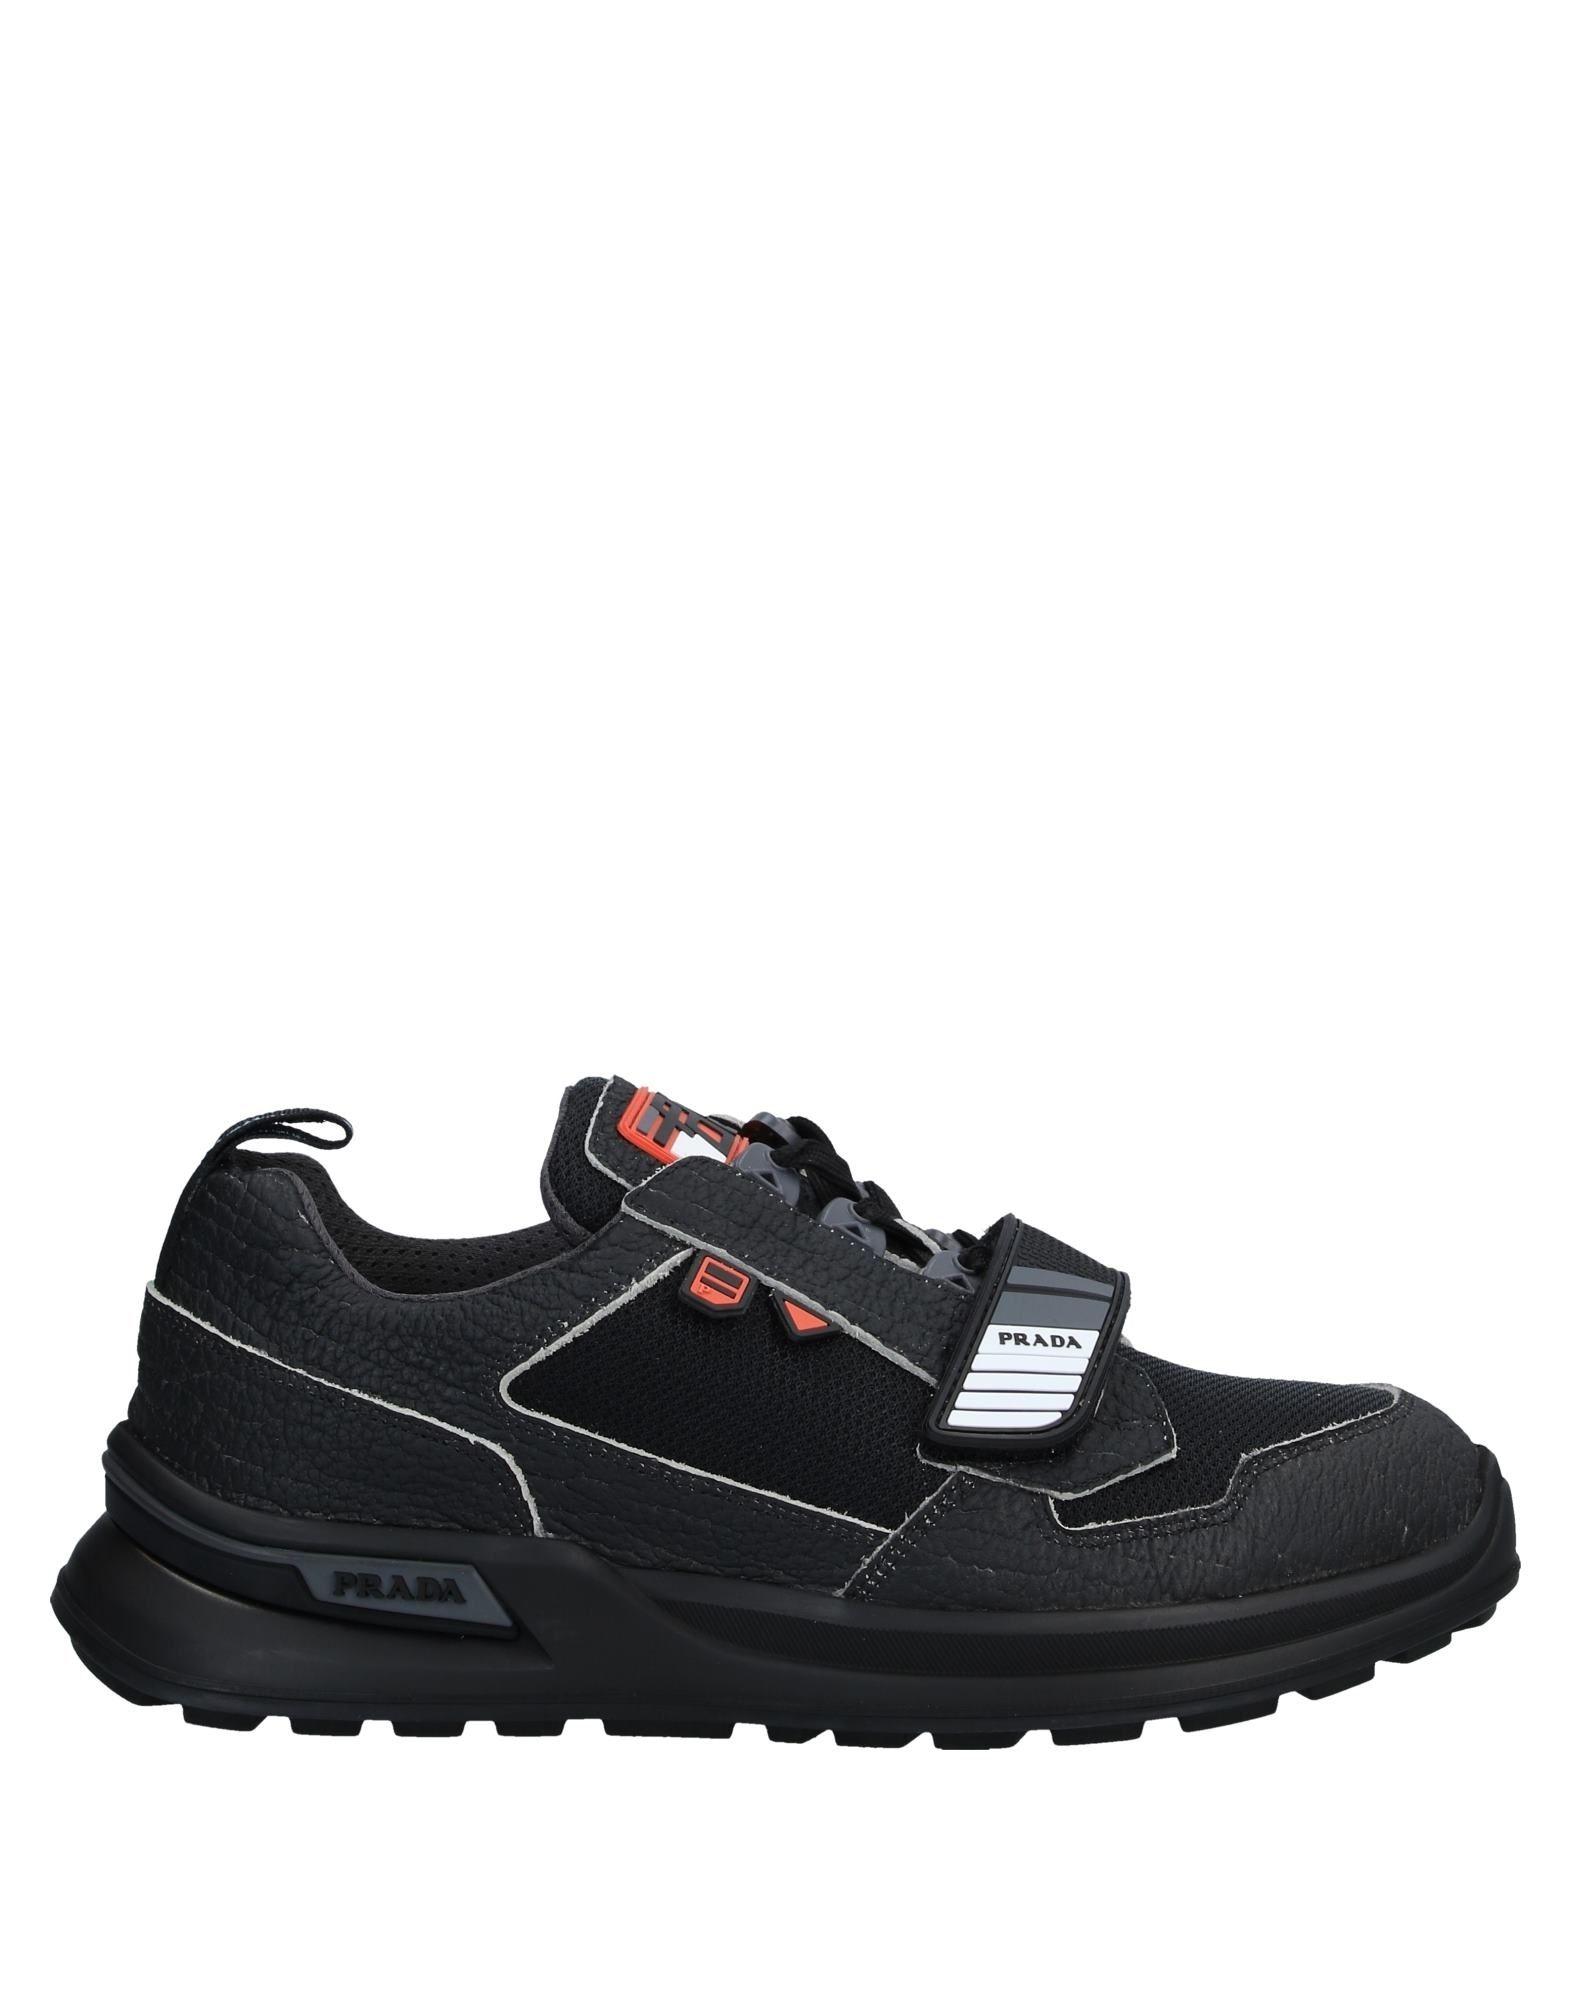 5ca14ebcda2 Prada Homme - Chaussures Prada - YOOX